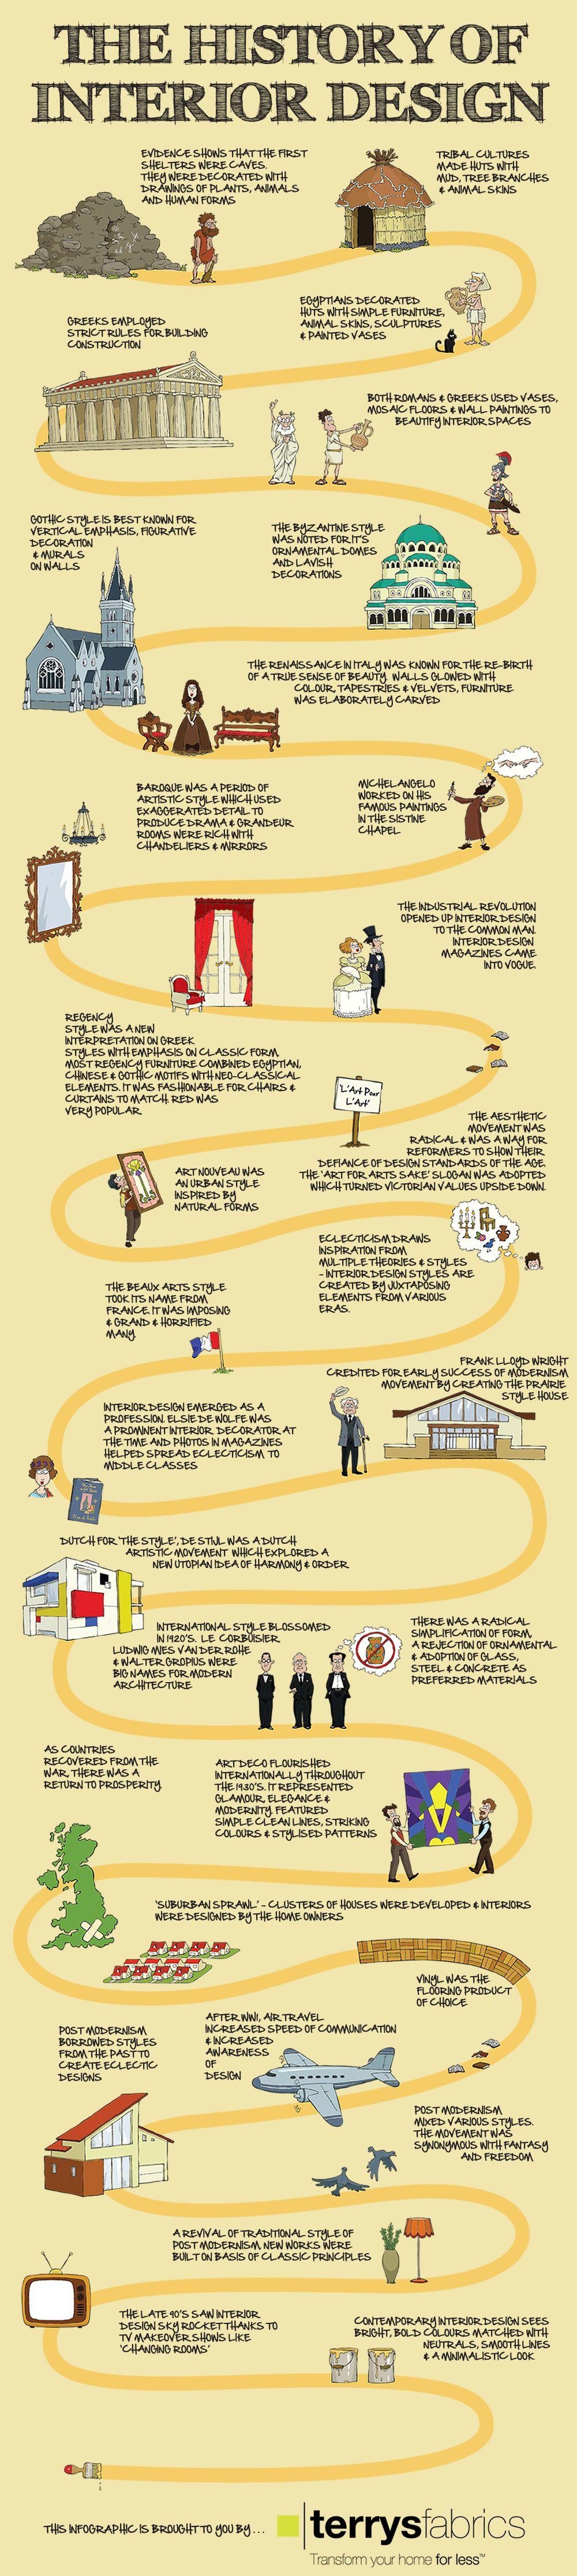 Infographic The History Of Interior Design Con Imagenes